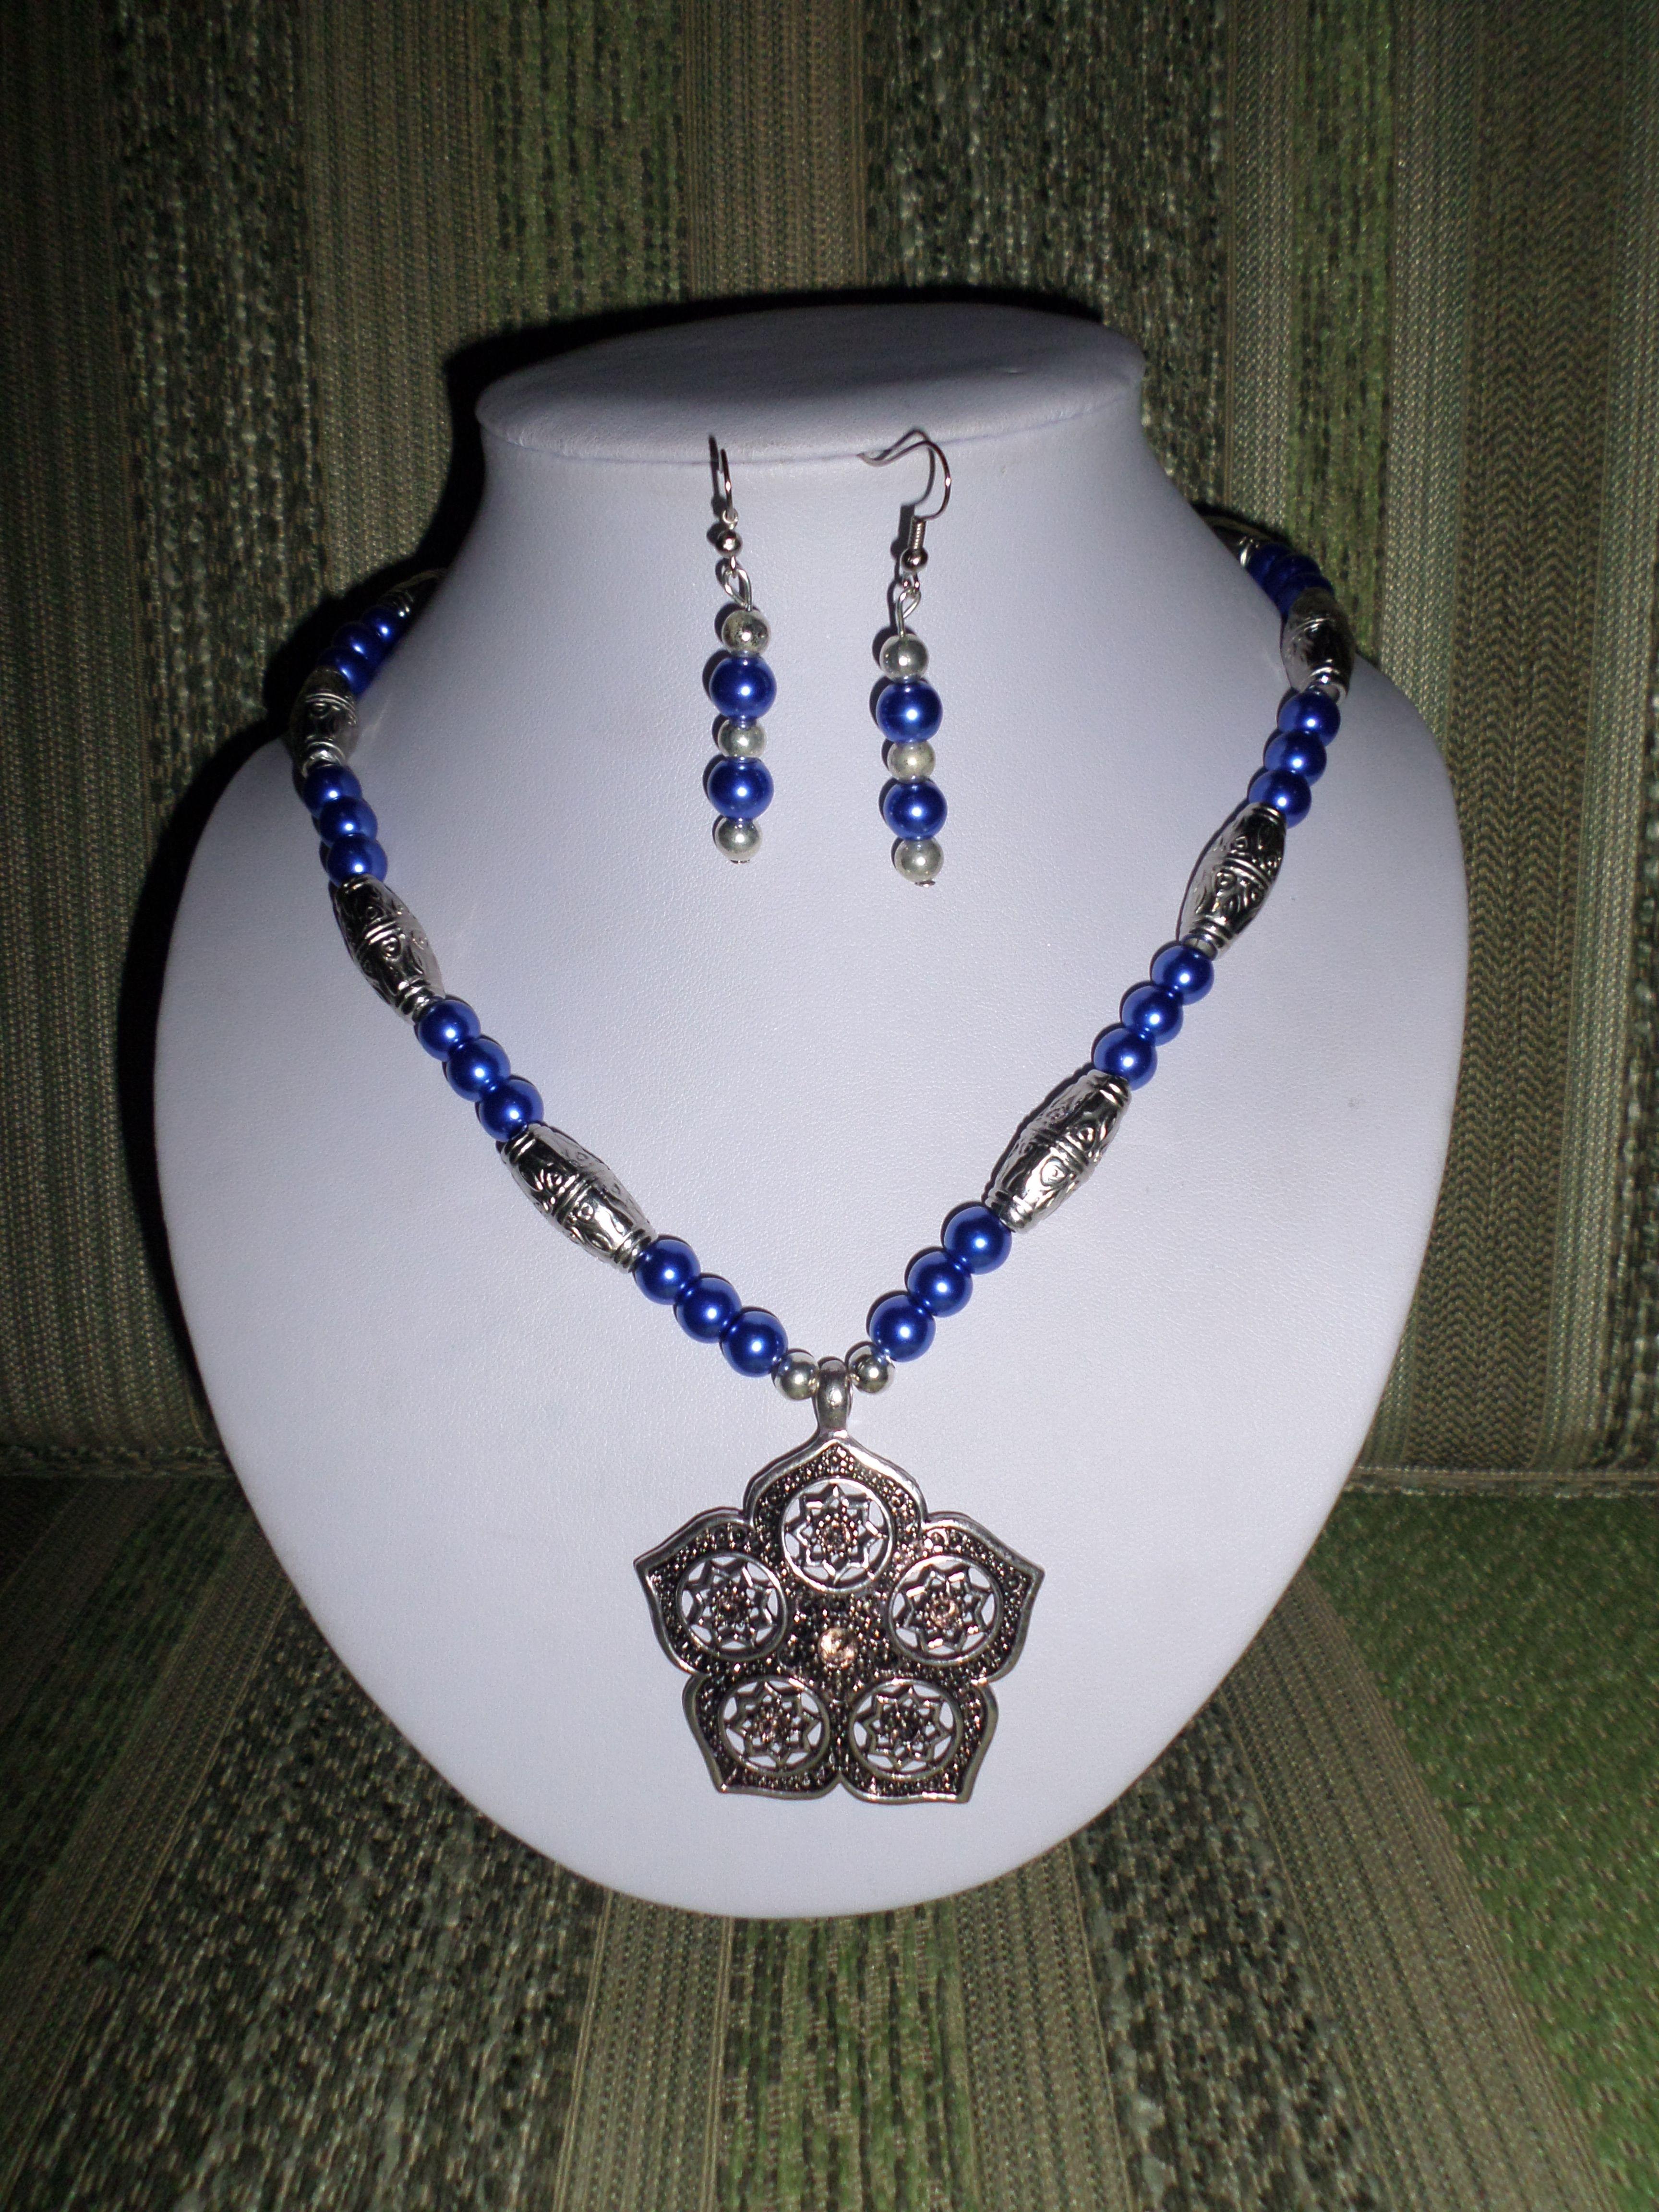 47e02b25a88d 3. Juego azul con aretes y collar de perlas con dije de flor ...